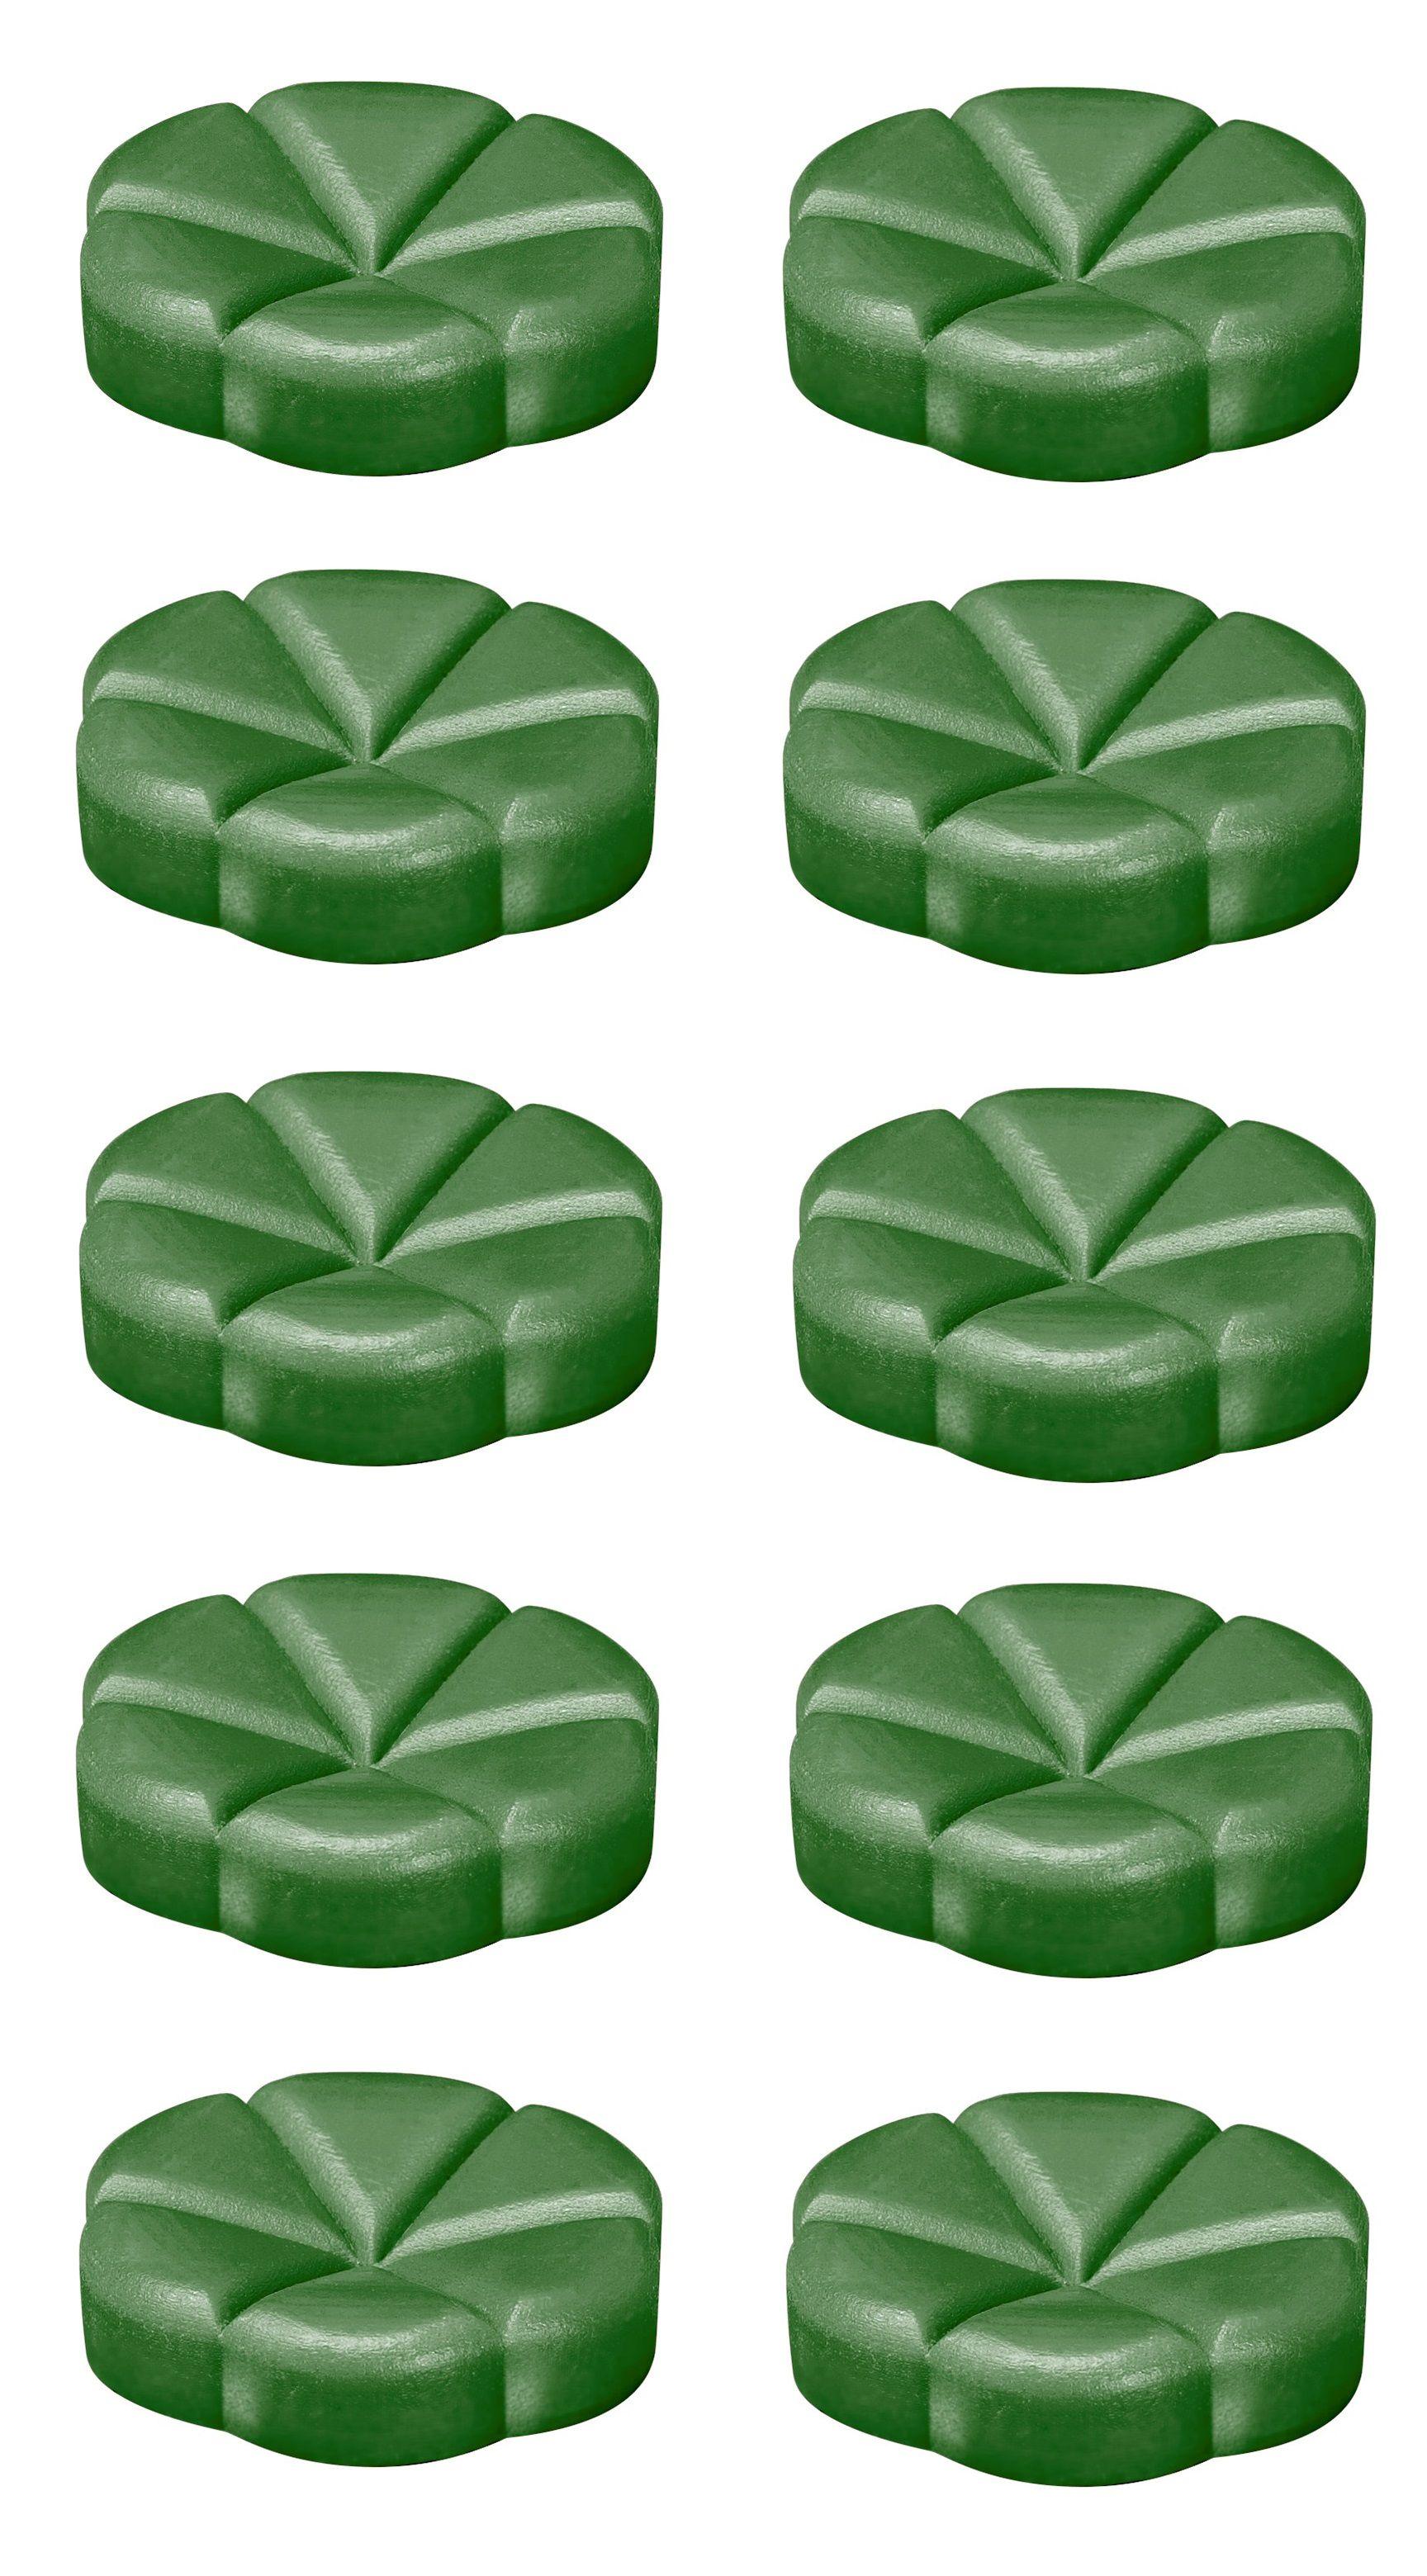 Bolsius geurchips Creations Honeydew Melon - 10 stuks